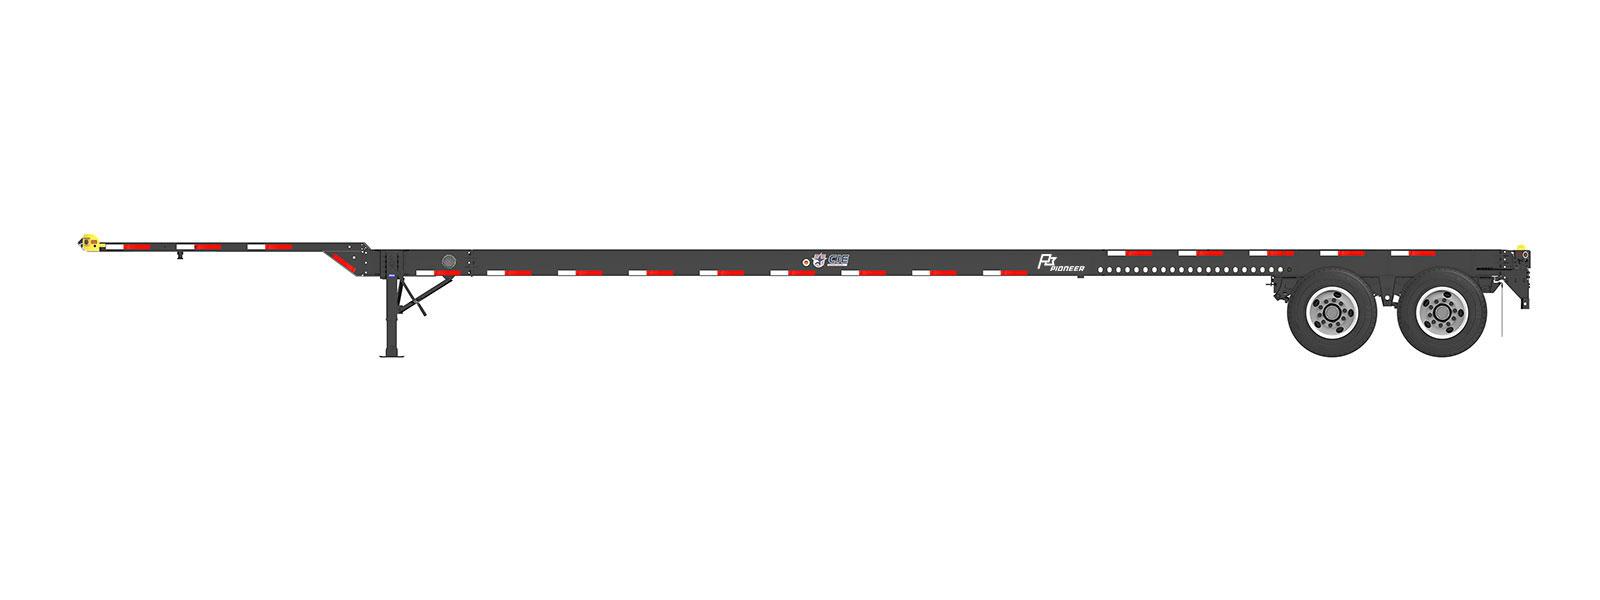 Pioneer 53' Gooseneck Tandem-Orthographic-Side